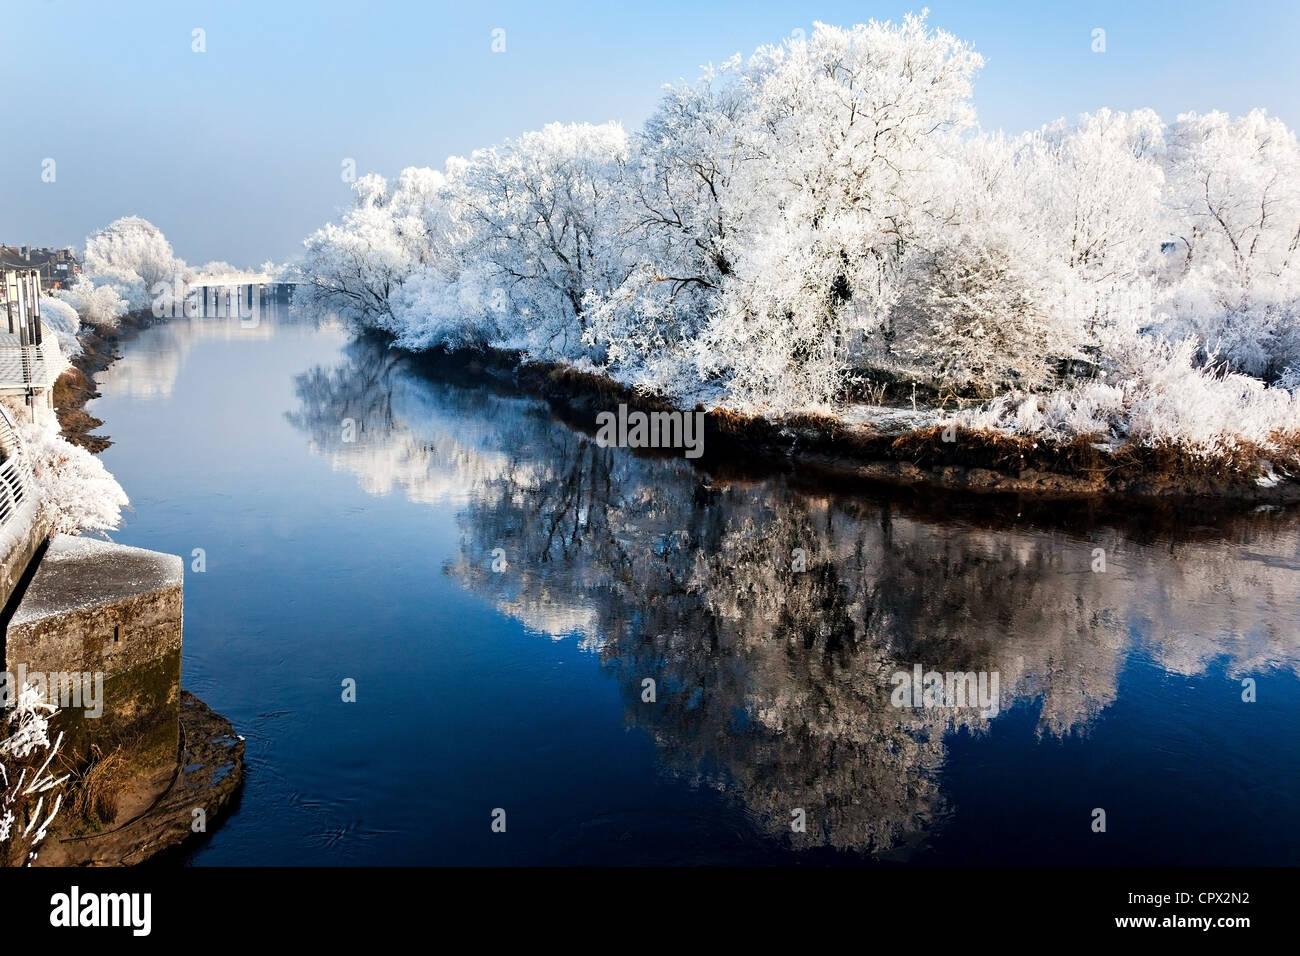 River shannon in winter, munster, limerick, ireland - Stock Image